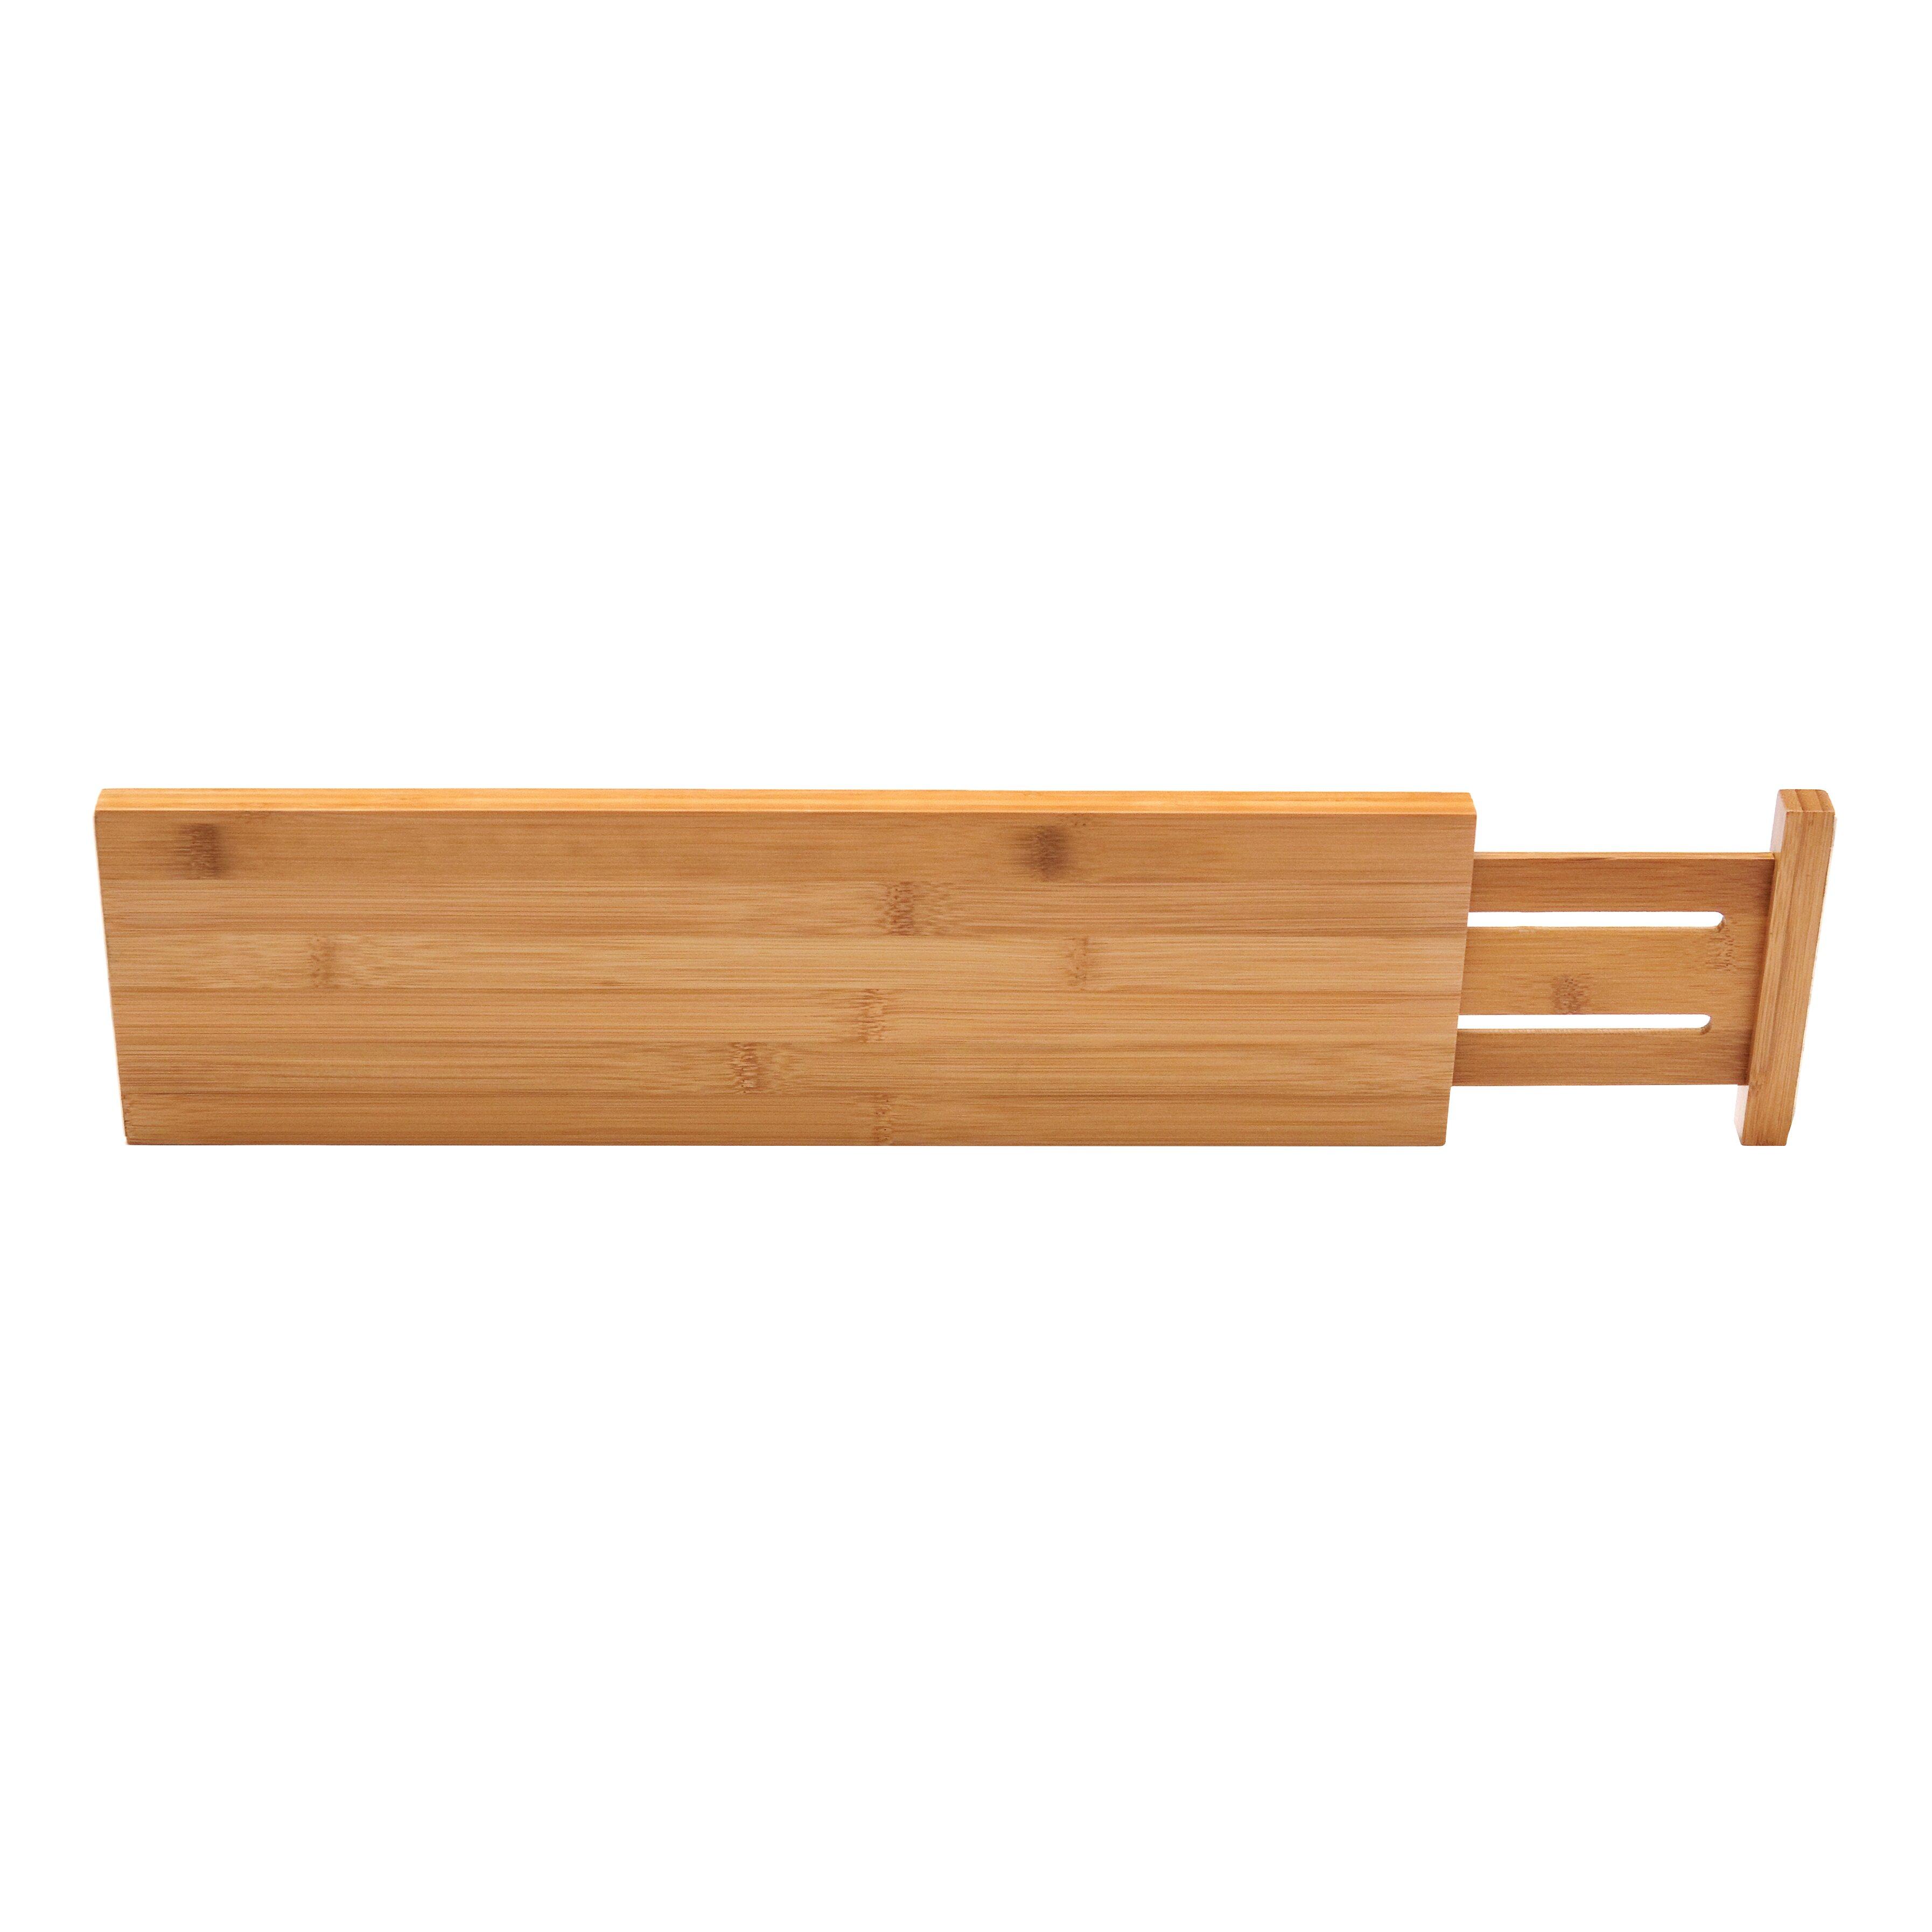 Lipper International Bamboo Kitchen Drawer Divider